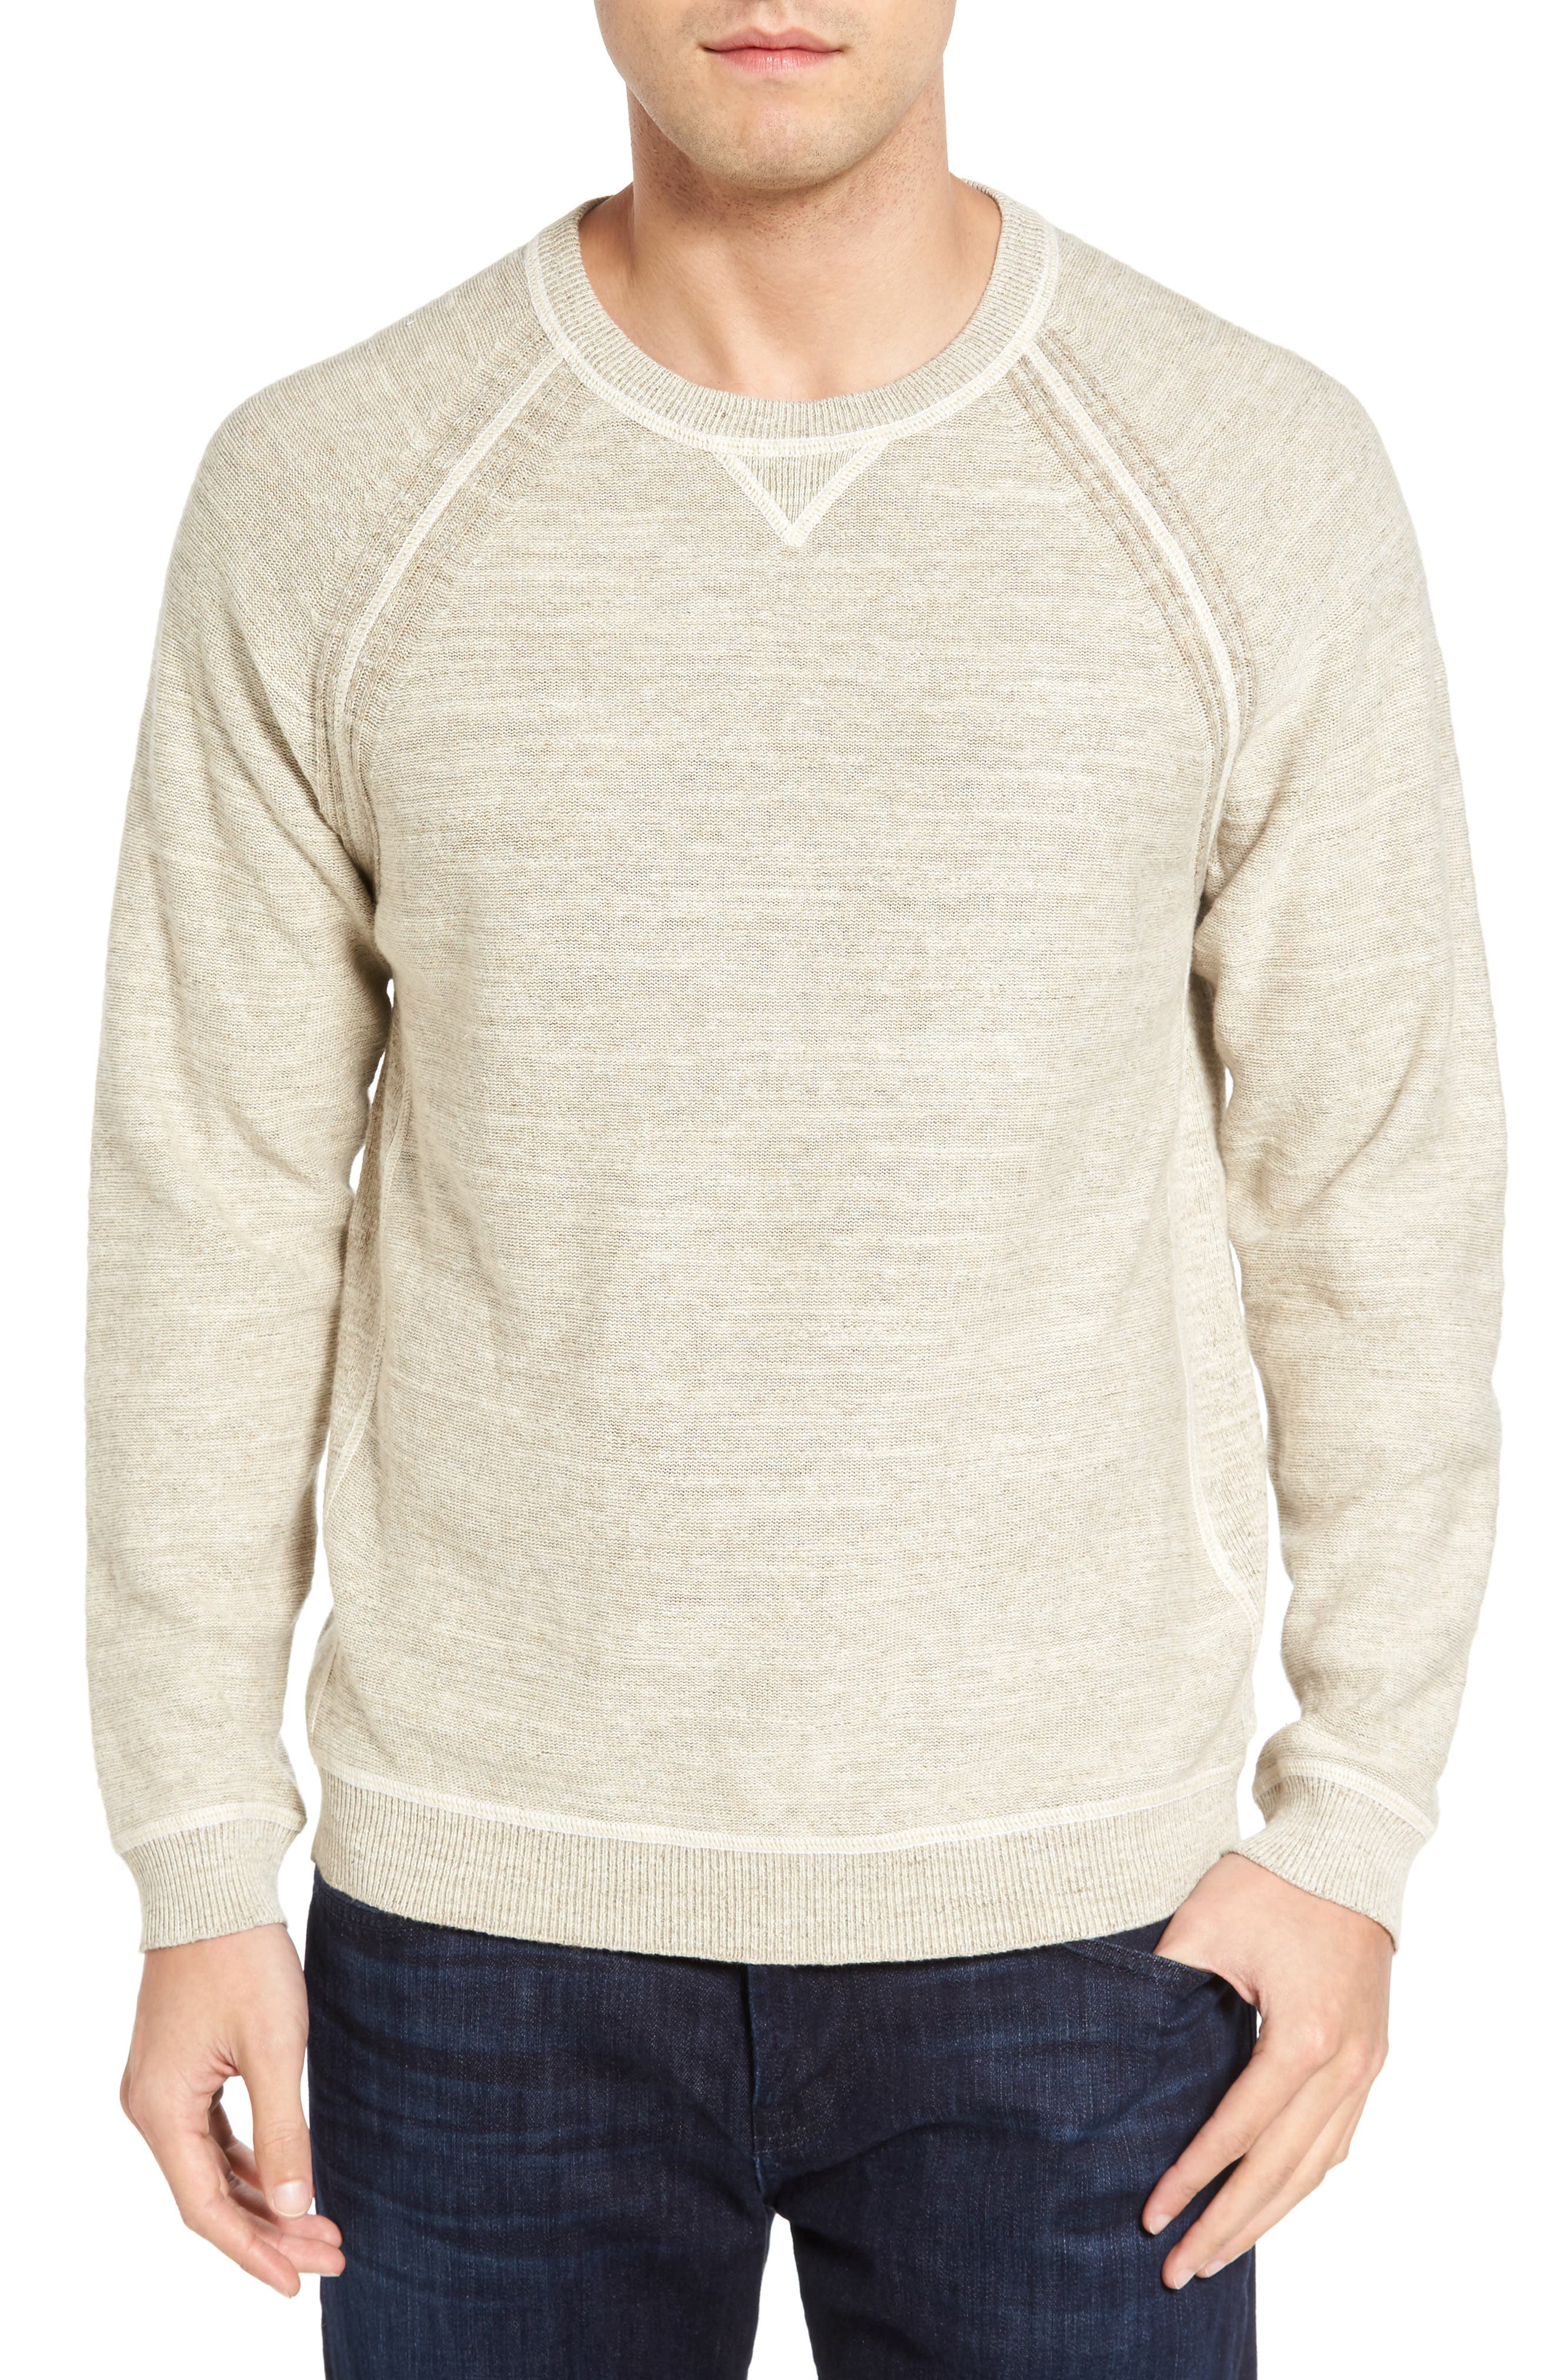 Main Image - Tommy Bahama Sandy Bay Reversible Crewneck Sweater